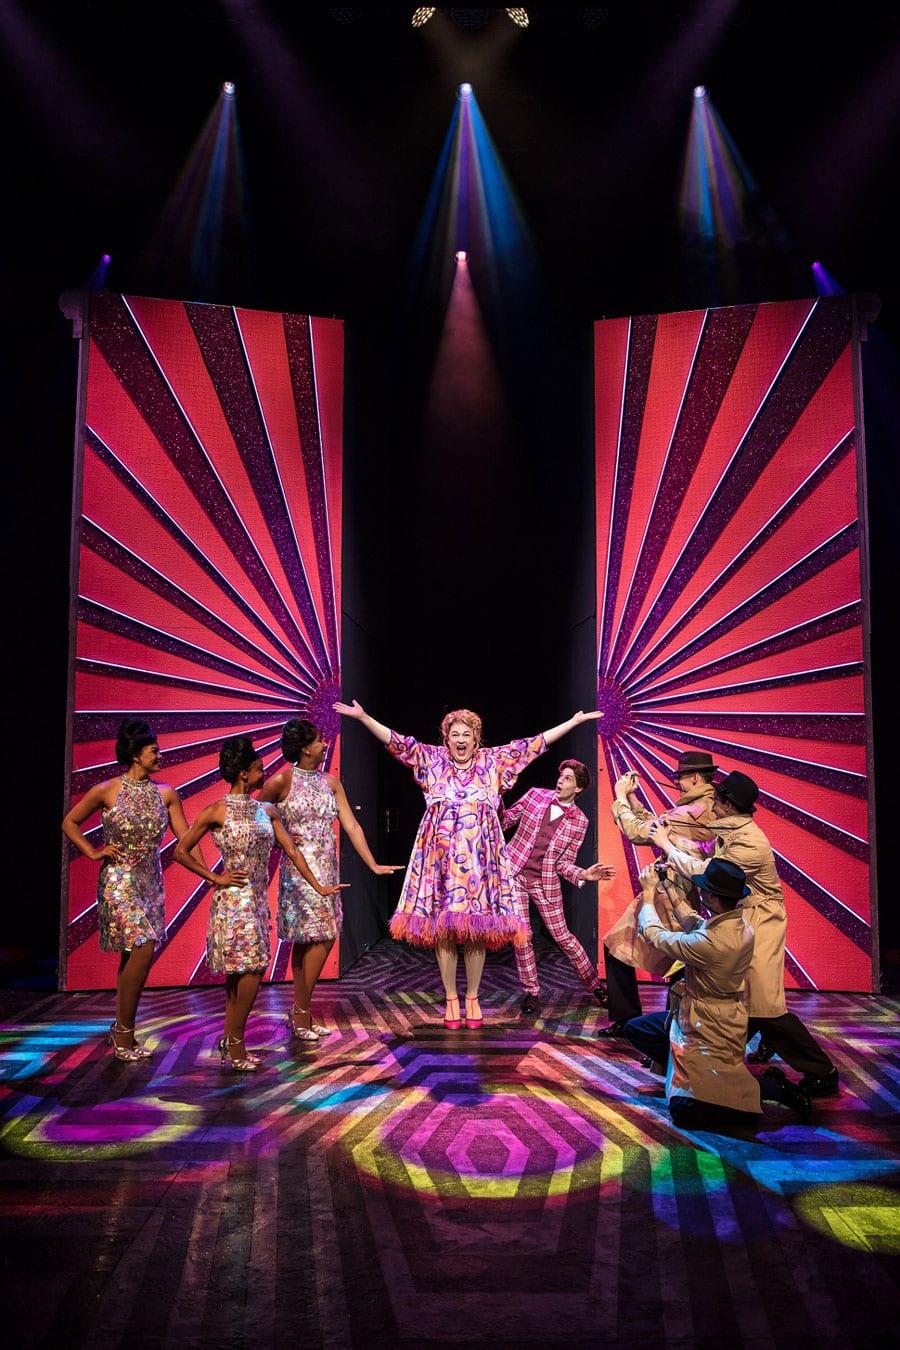 Hairspray musical UK tour tickets